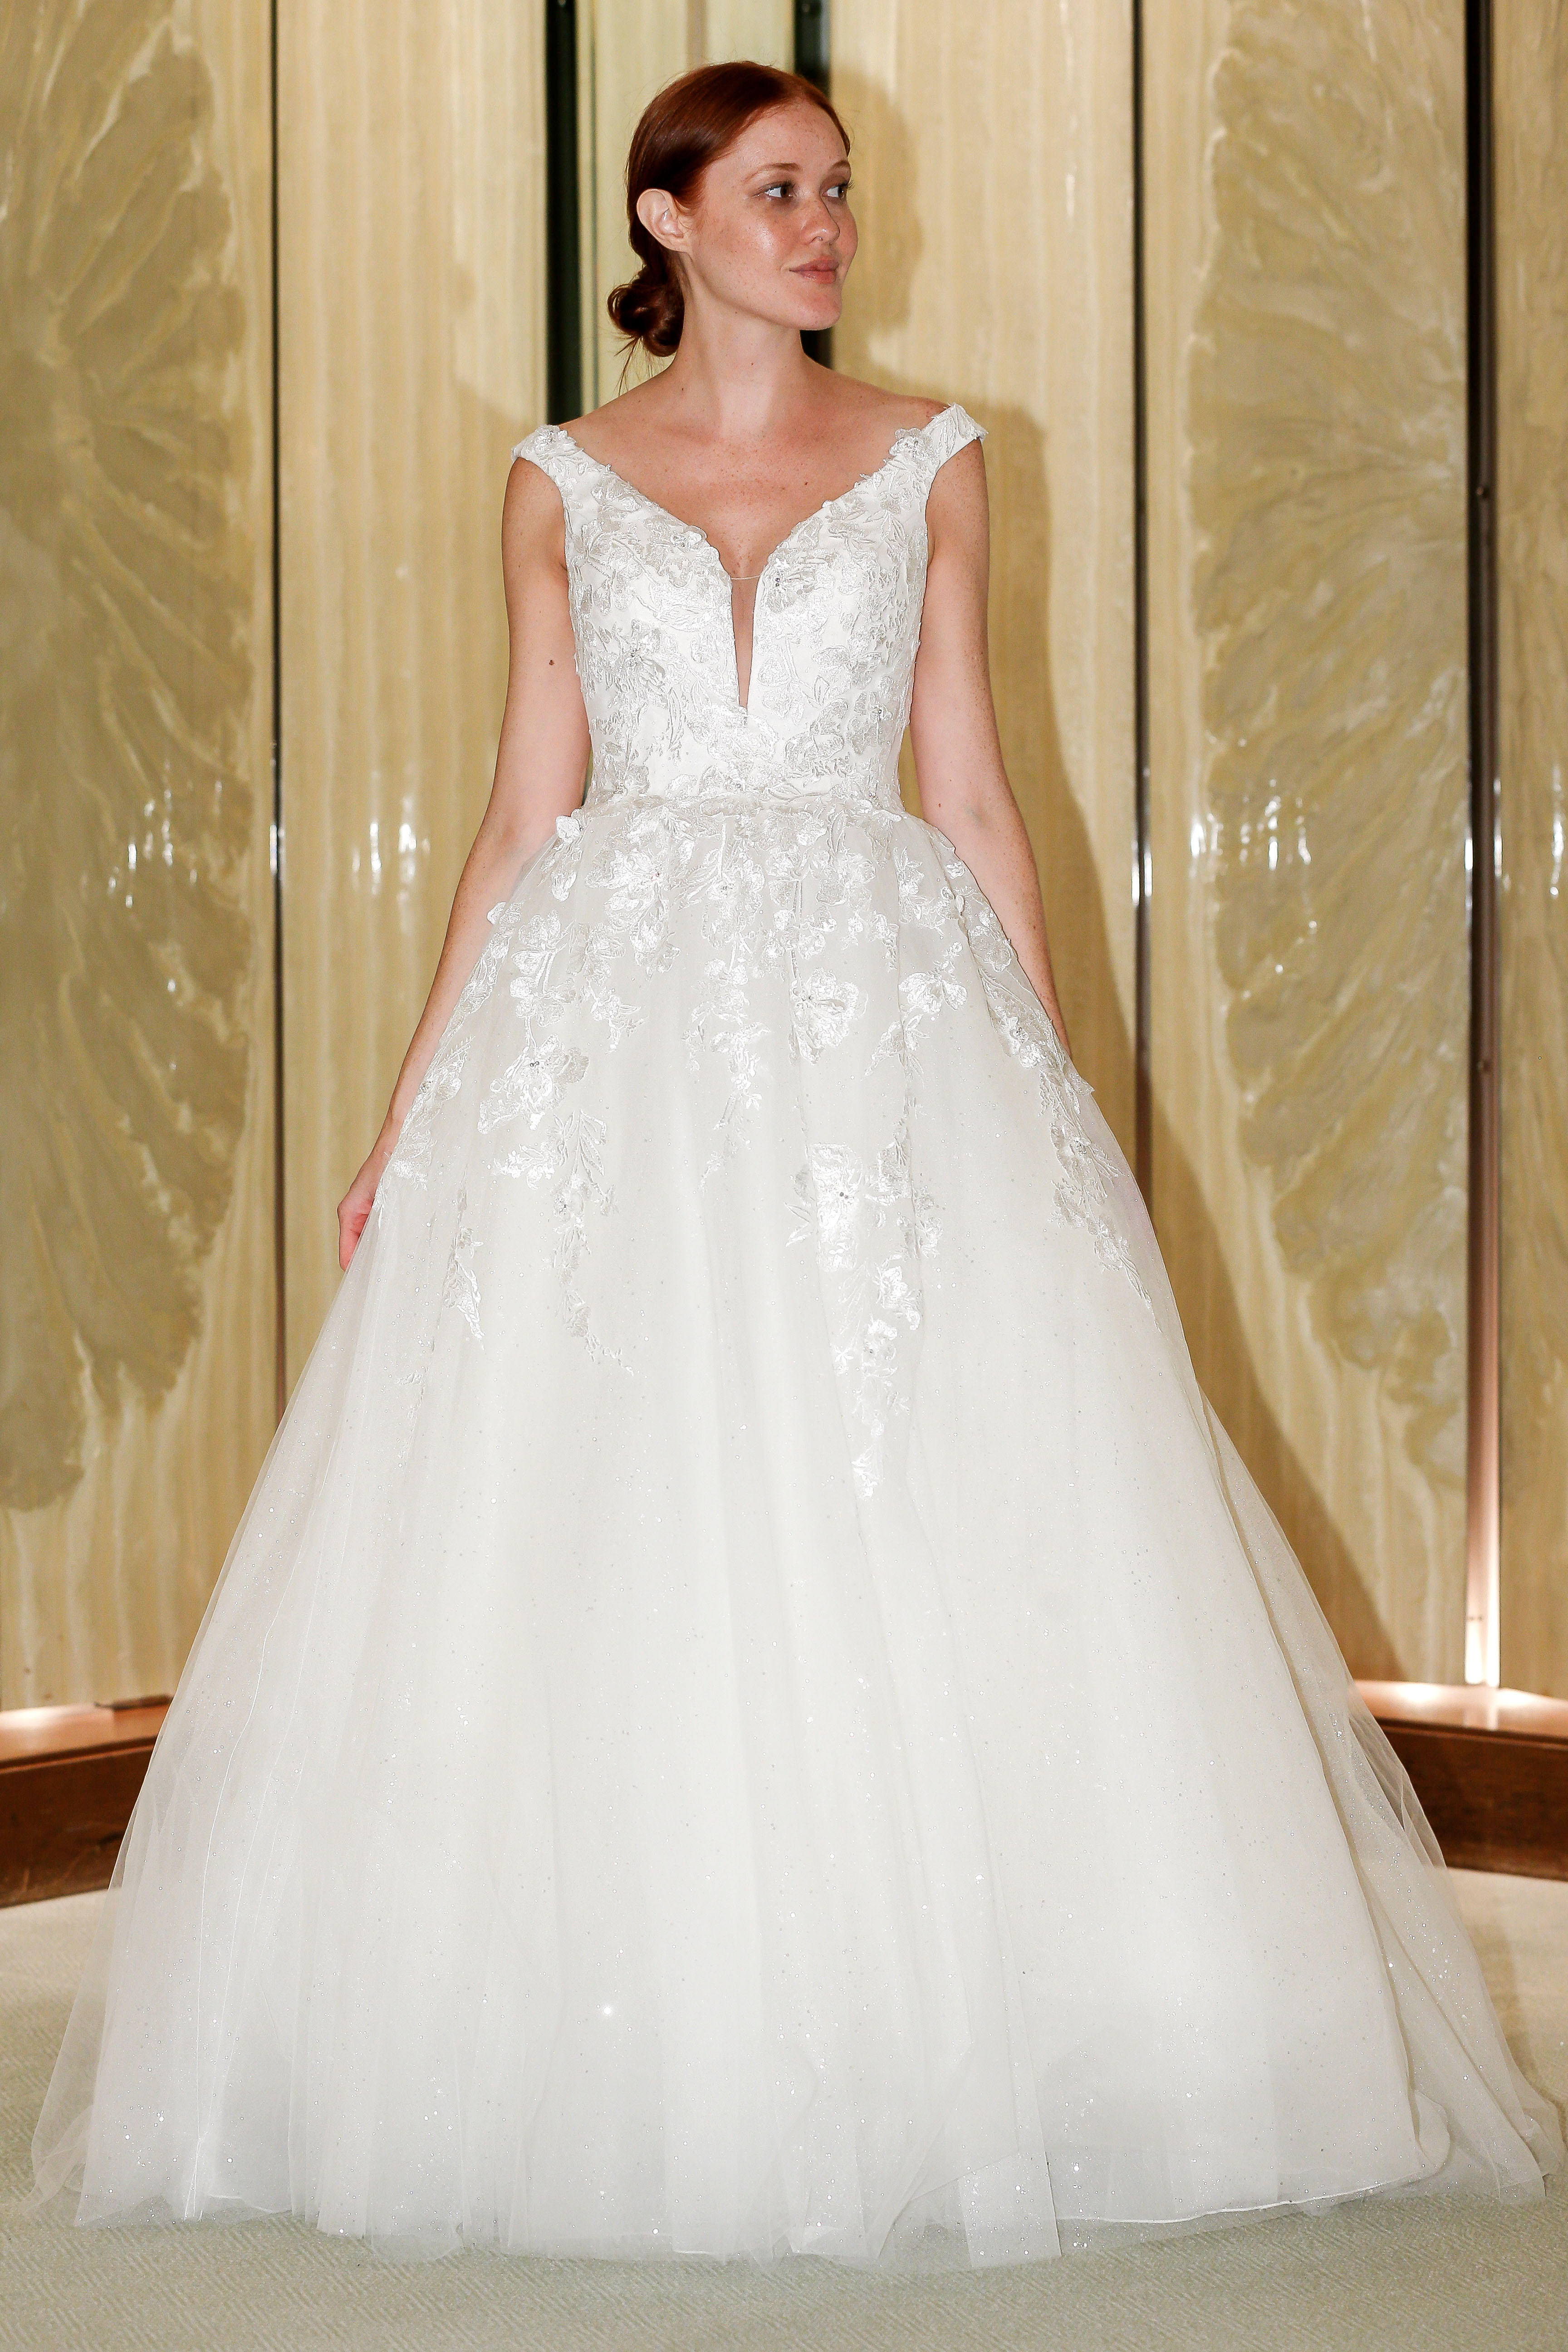 randy fenoli wedding dress off the shoulder metallic floral tulle ball gown